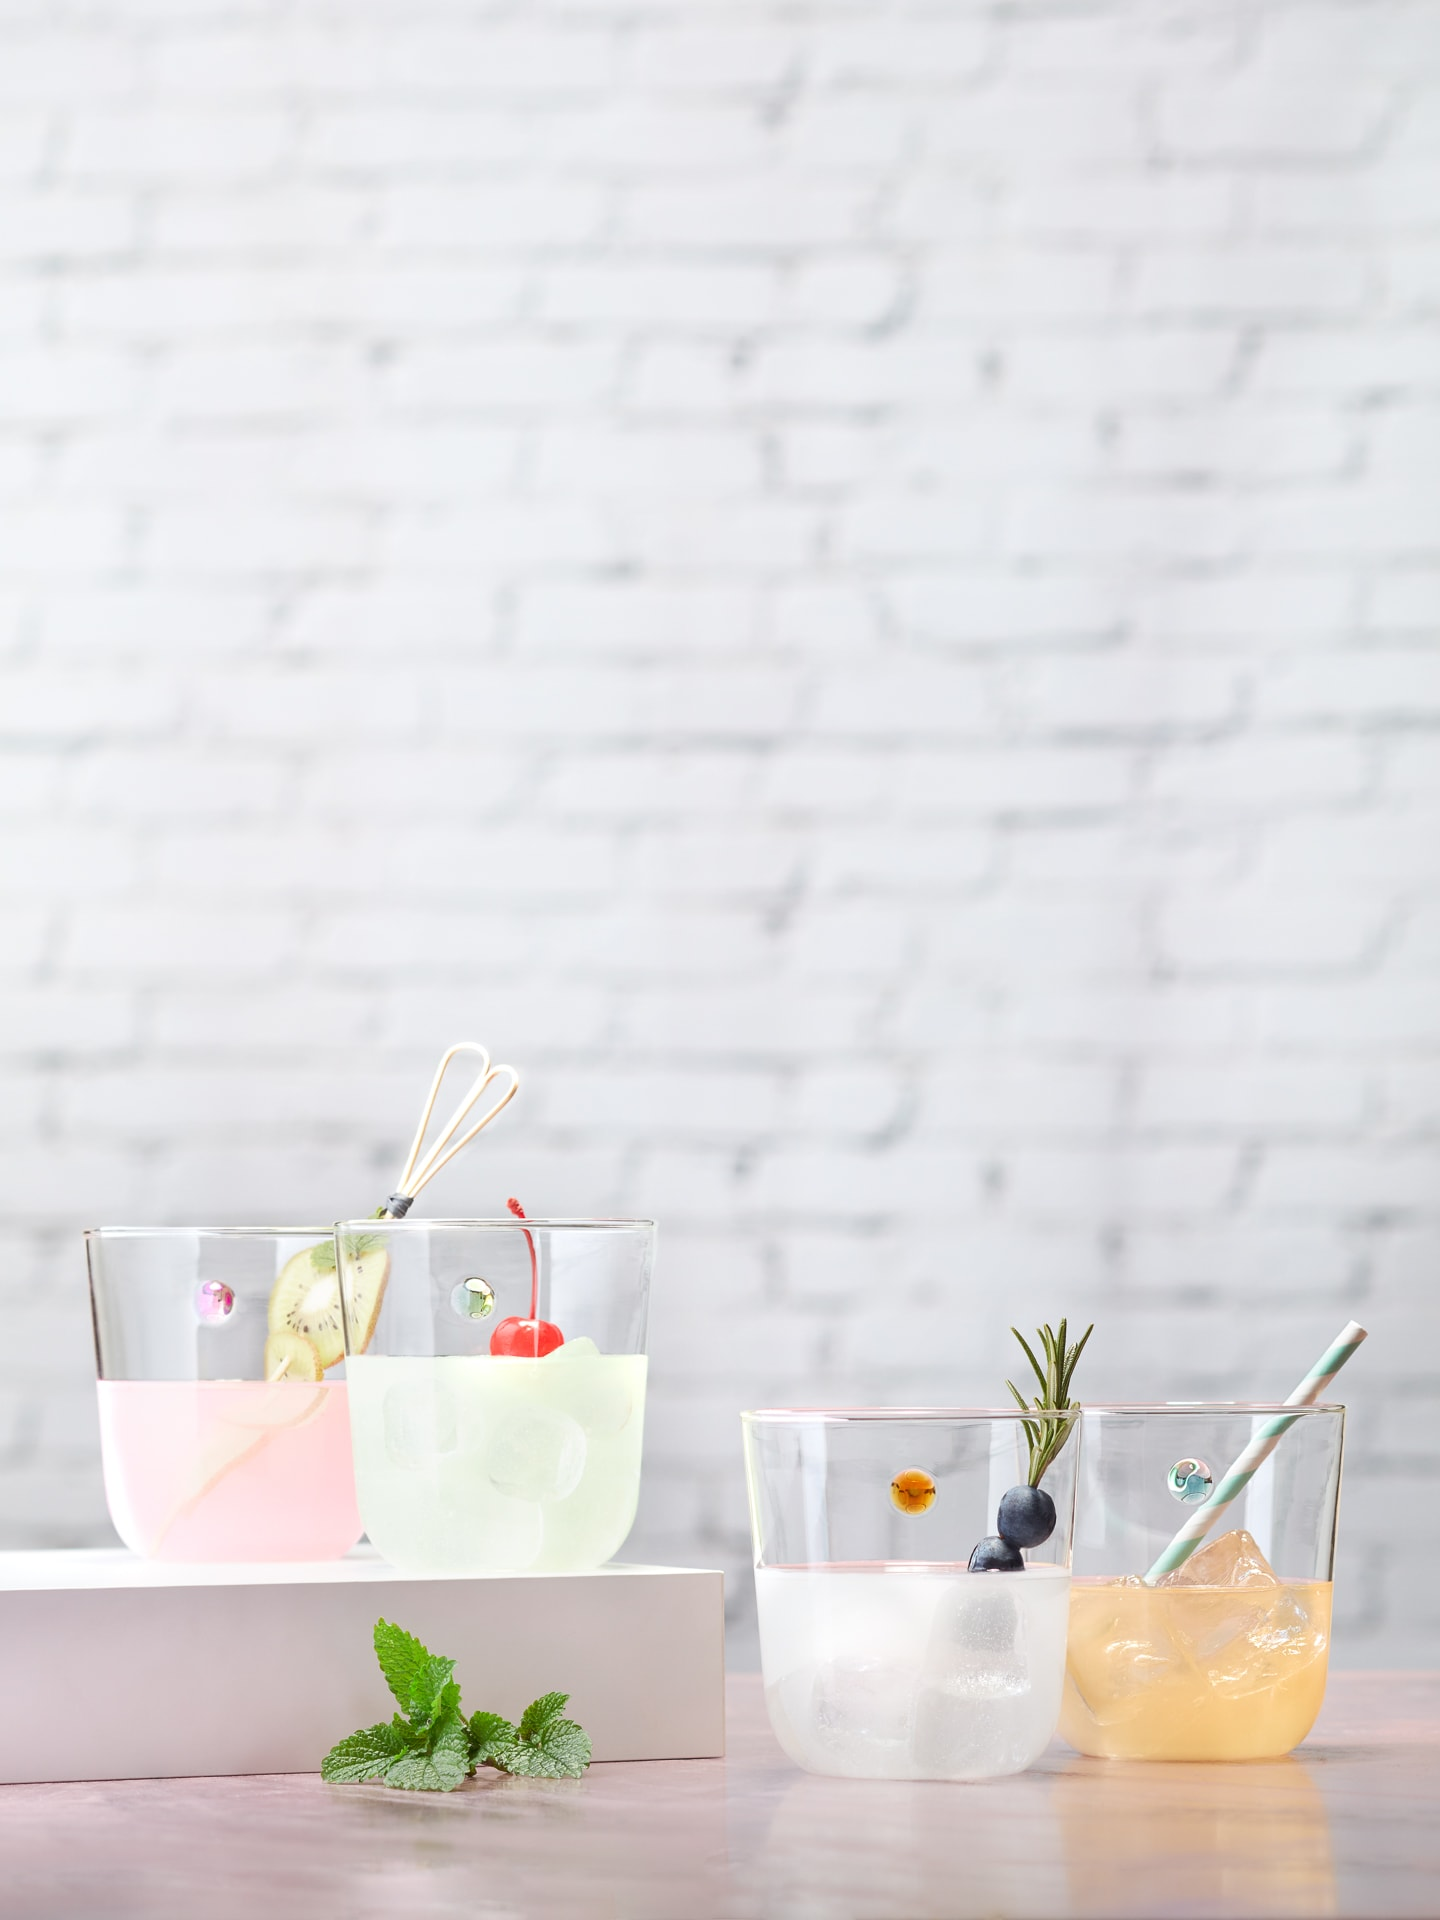 cocktail mixology bicchieri vetro still life milano verona udine trieste